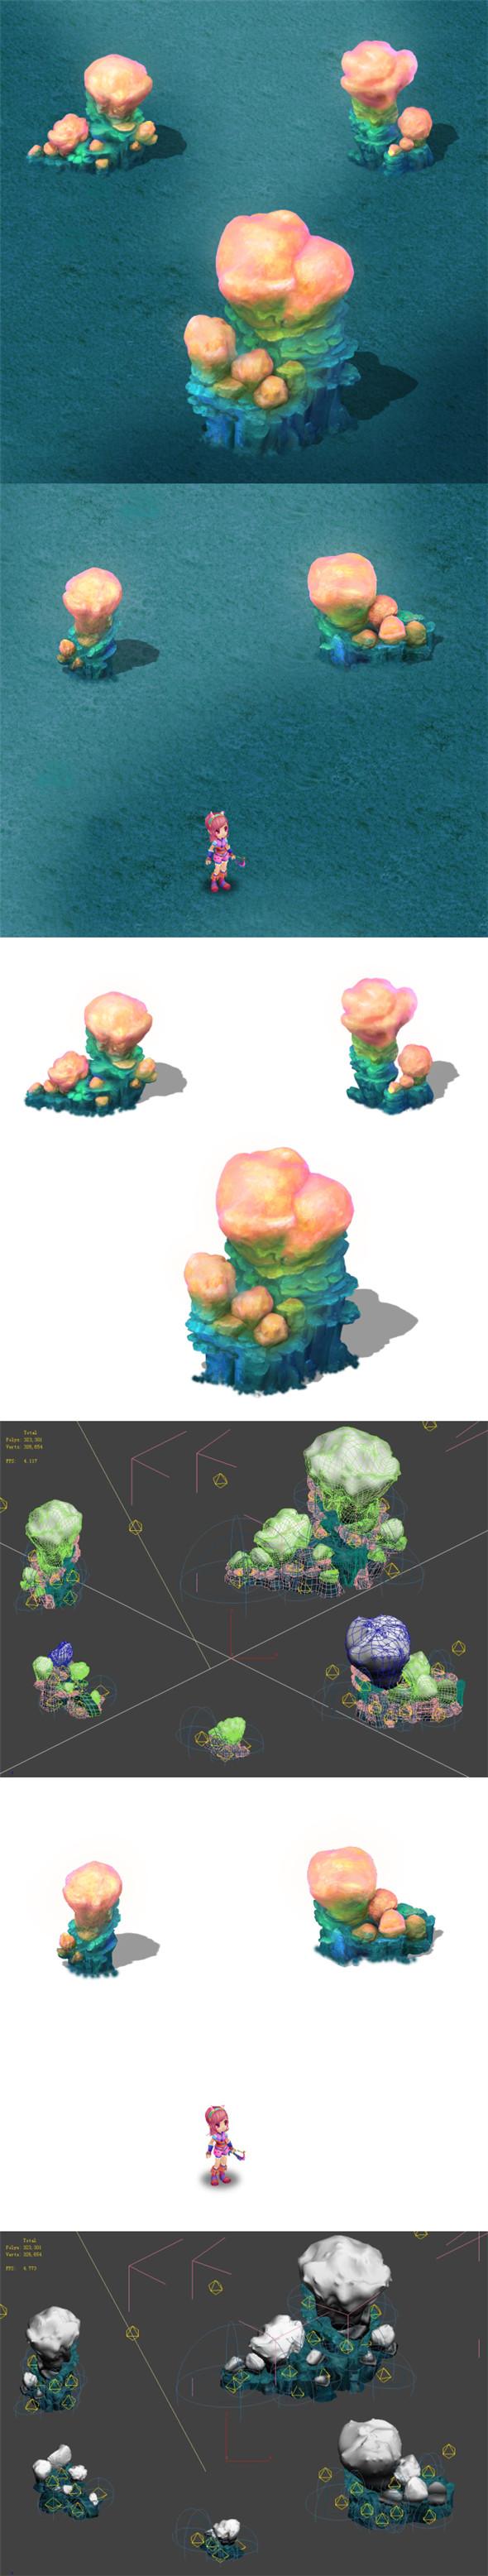 Submarine Cartoon World - Sarcoma Coral 03 - 3DOcean Item for Sale